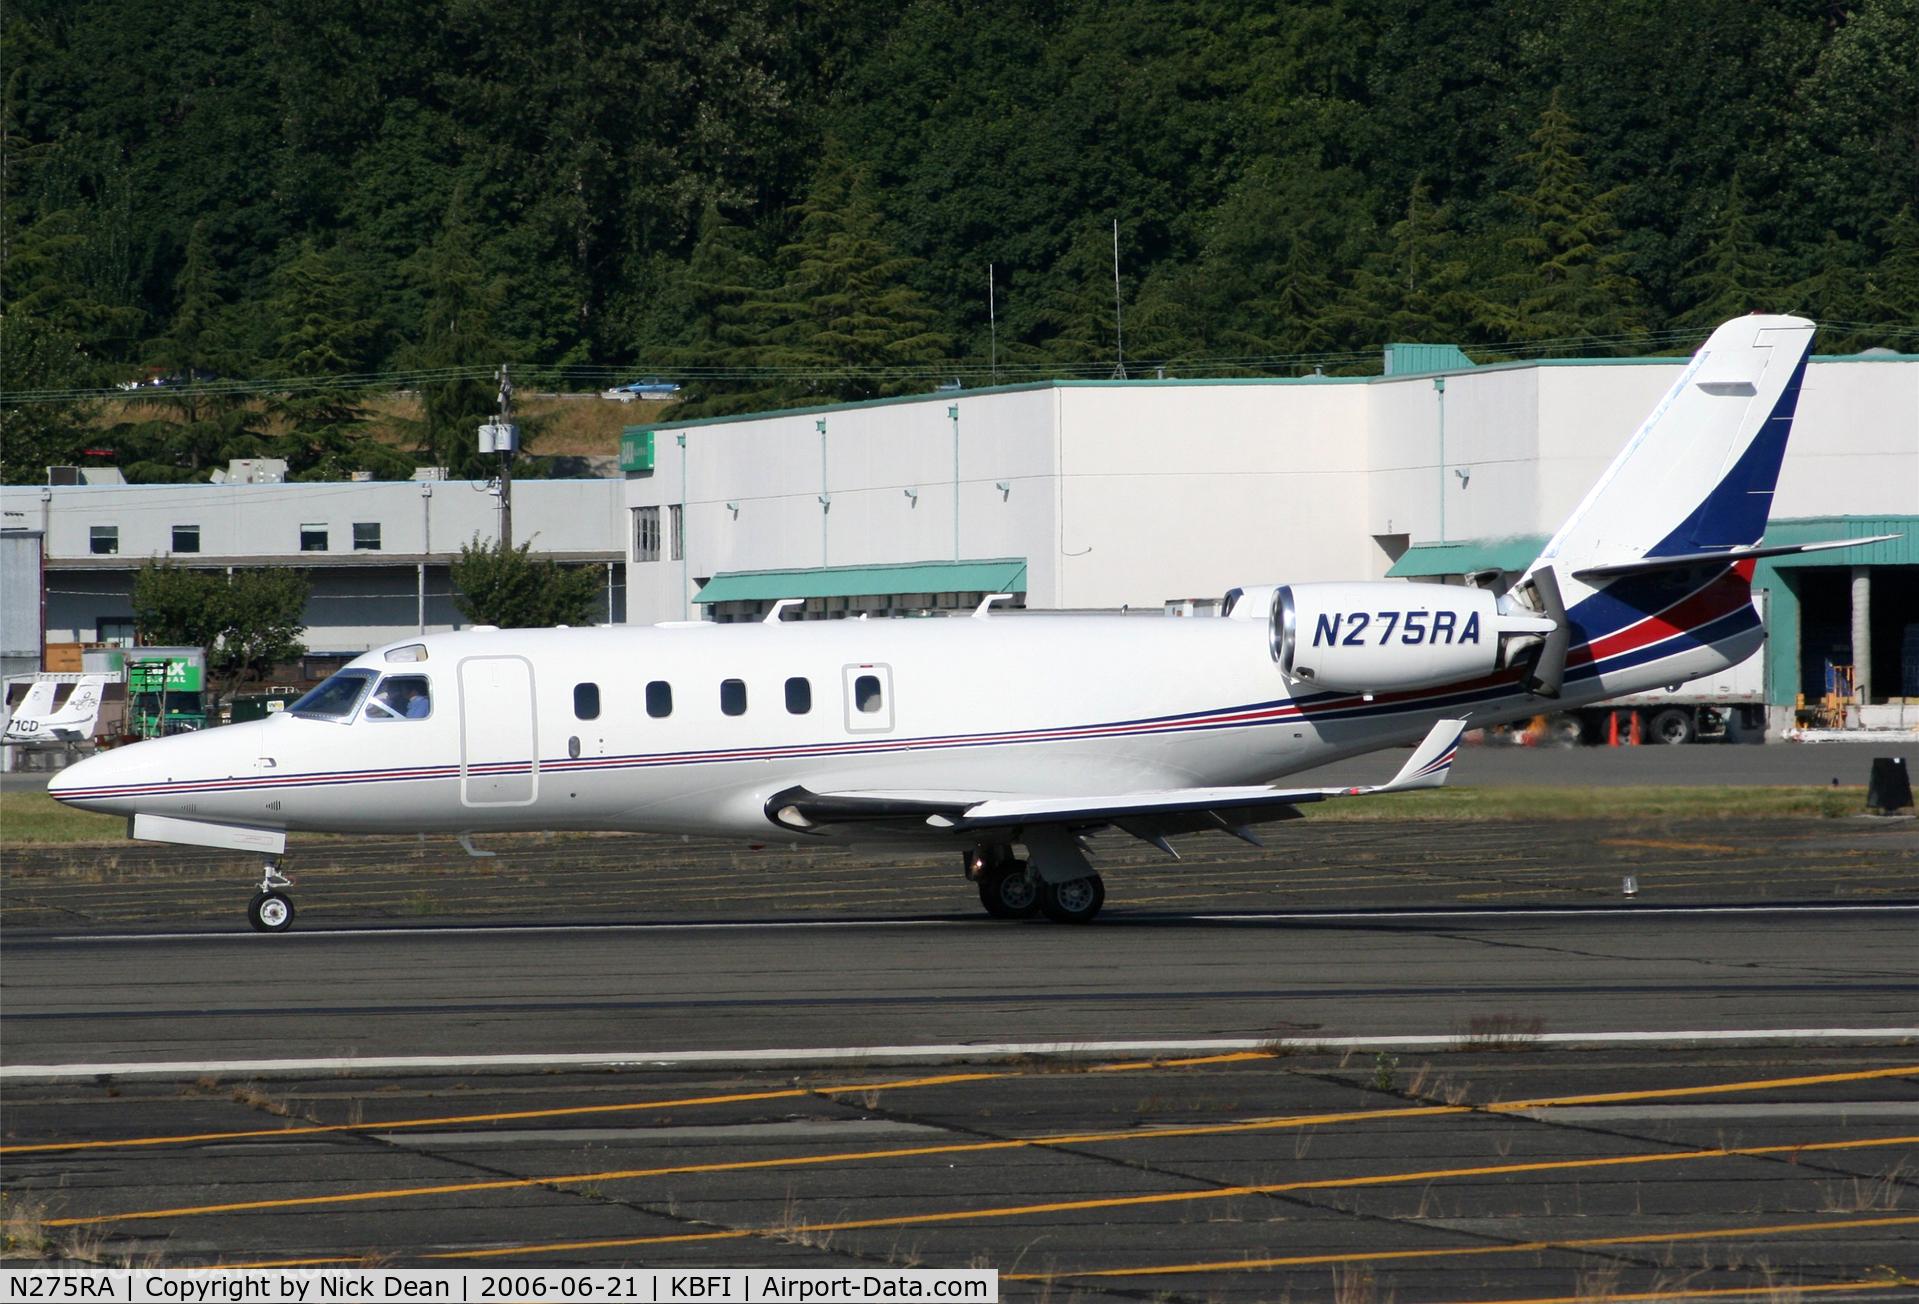 N275RA, 1998 Israel Aircraft Industries IAI-1125A Astra SPX C/N 098, KBFI